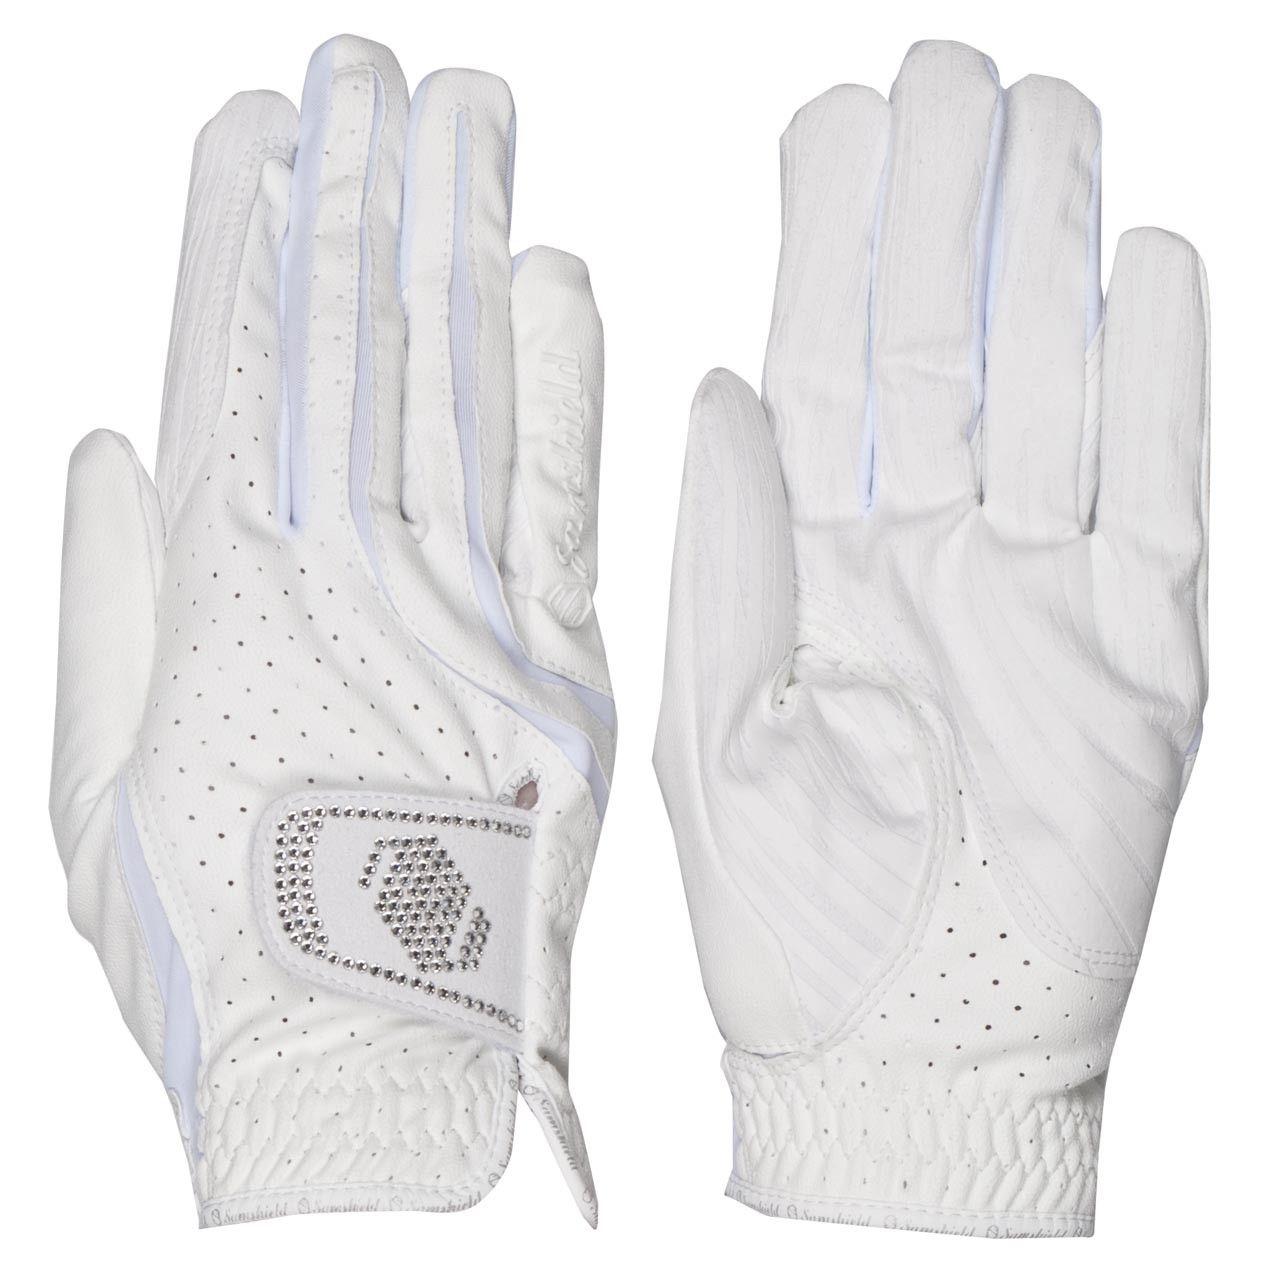 Samshield handschoenen Swarovski wit maat:8